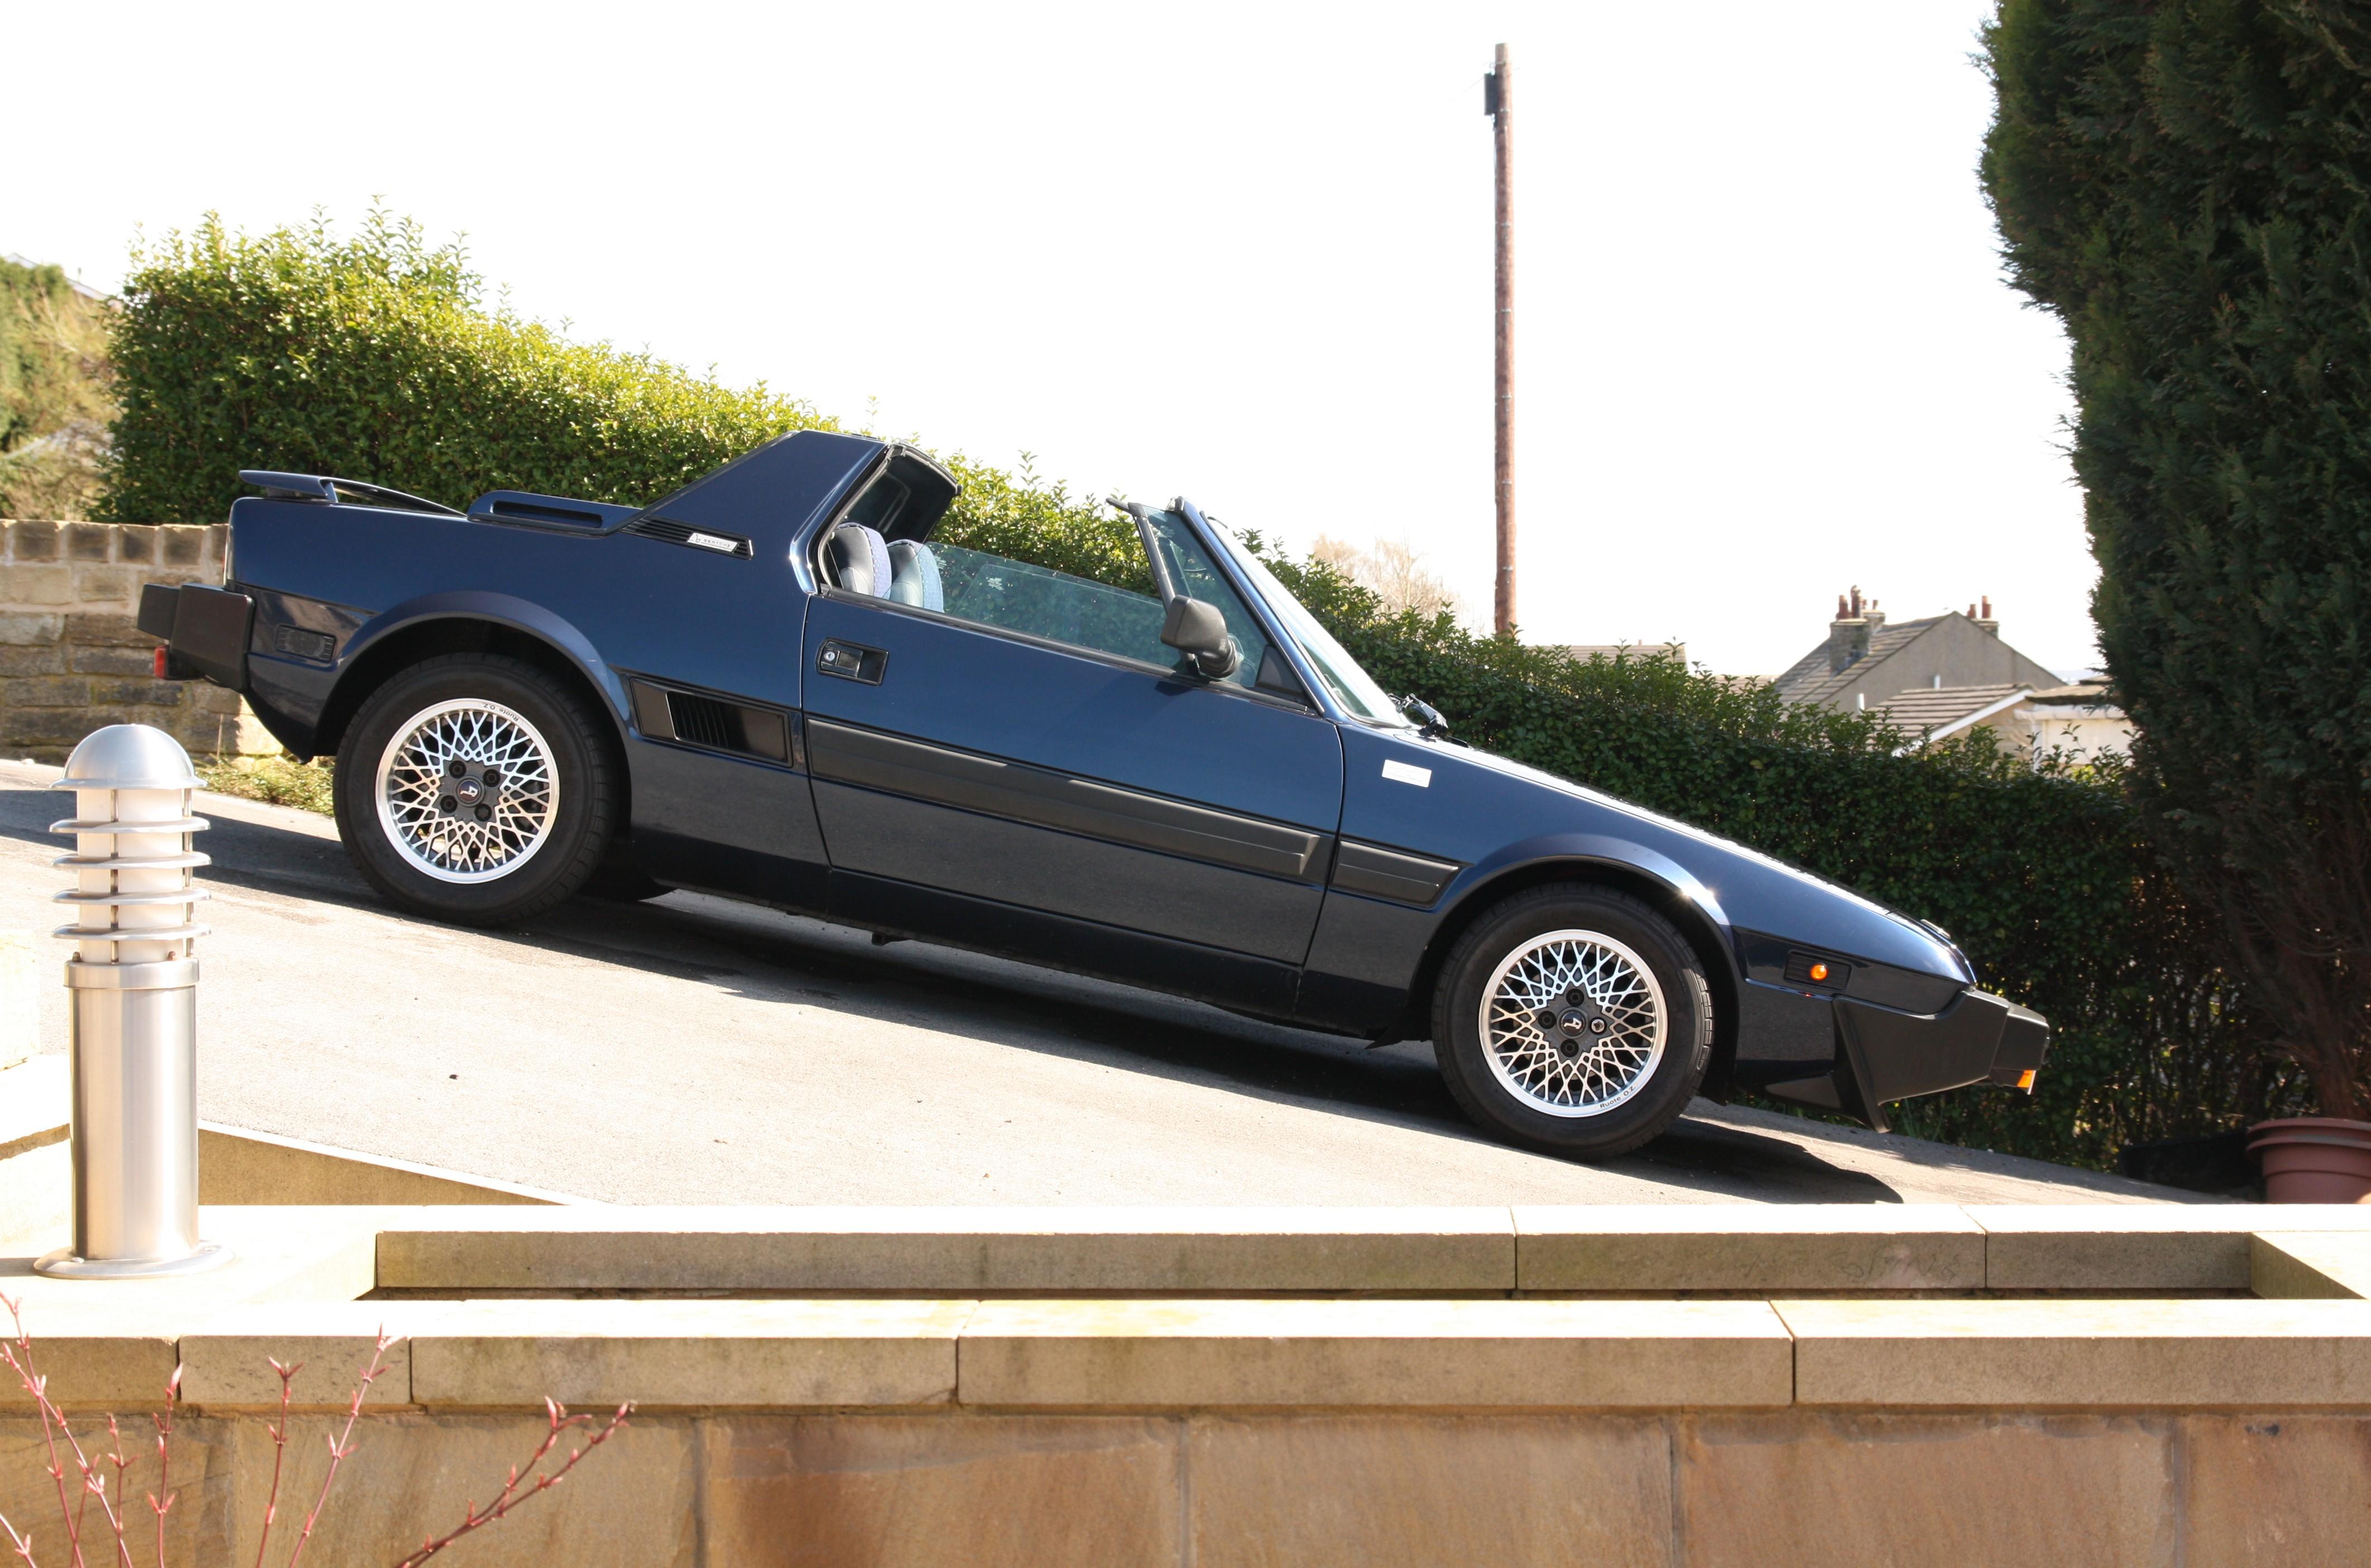 Fiat X1 9 >> Fiat X1/9 Gran Finale - The FIAT Forum - Photo Gallery